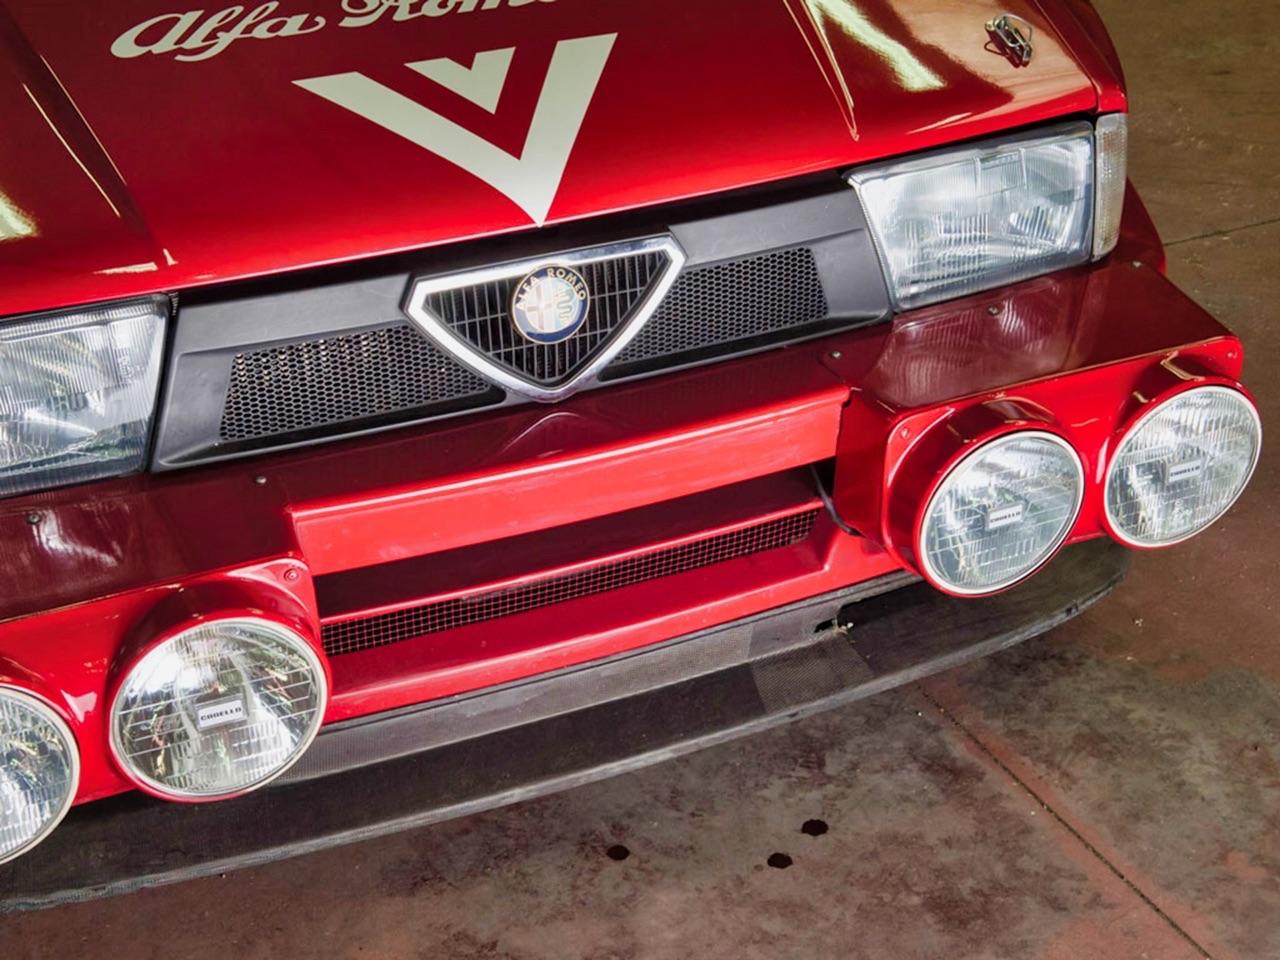 Alfa 75 Turbo IMSA - La plus ultime ! 1